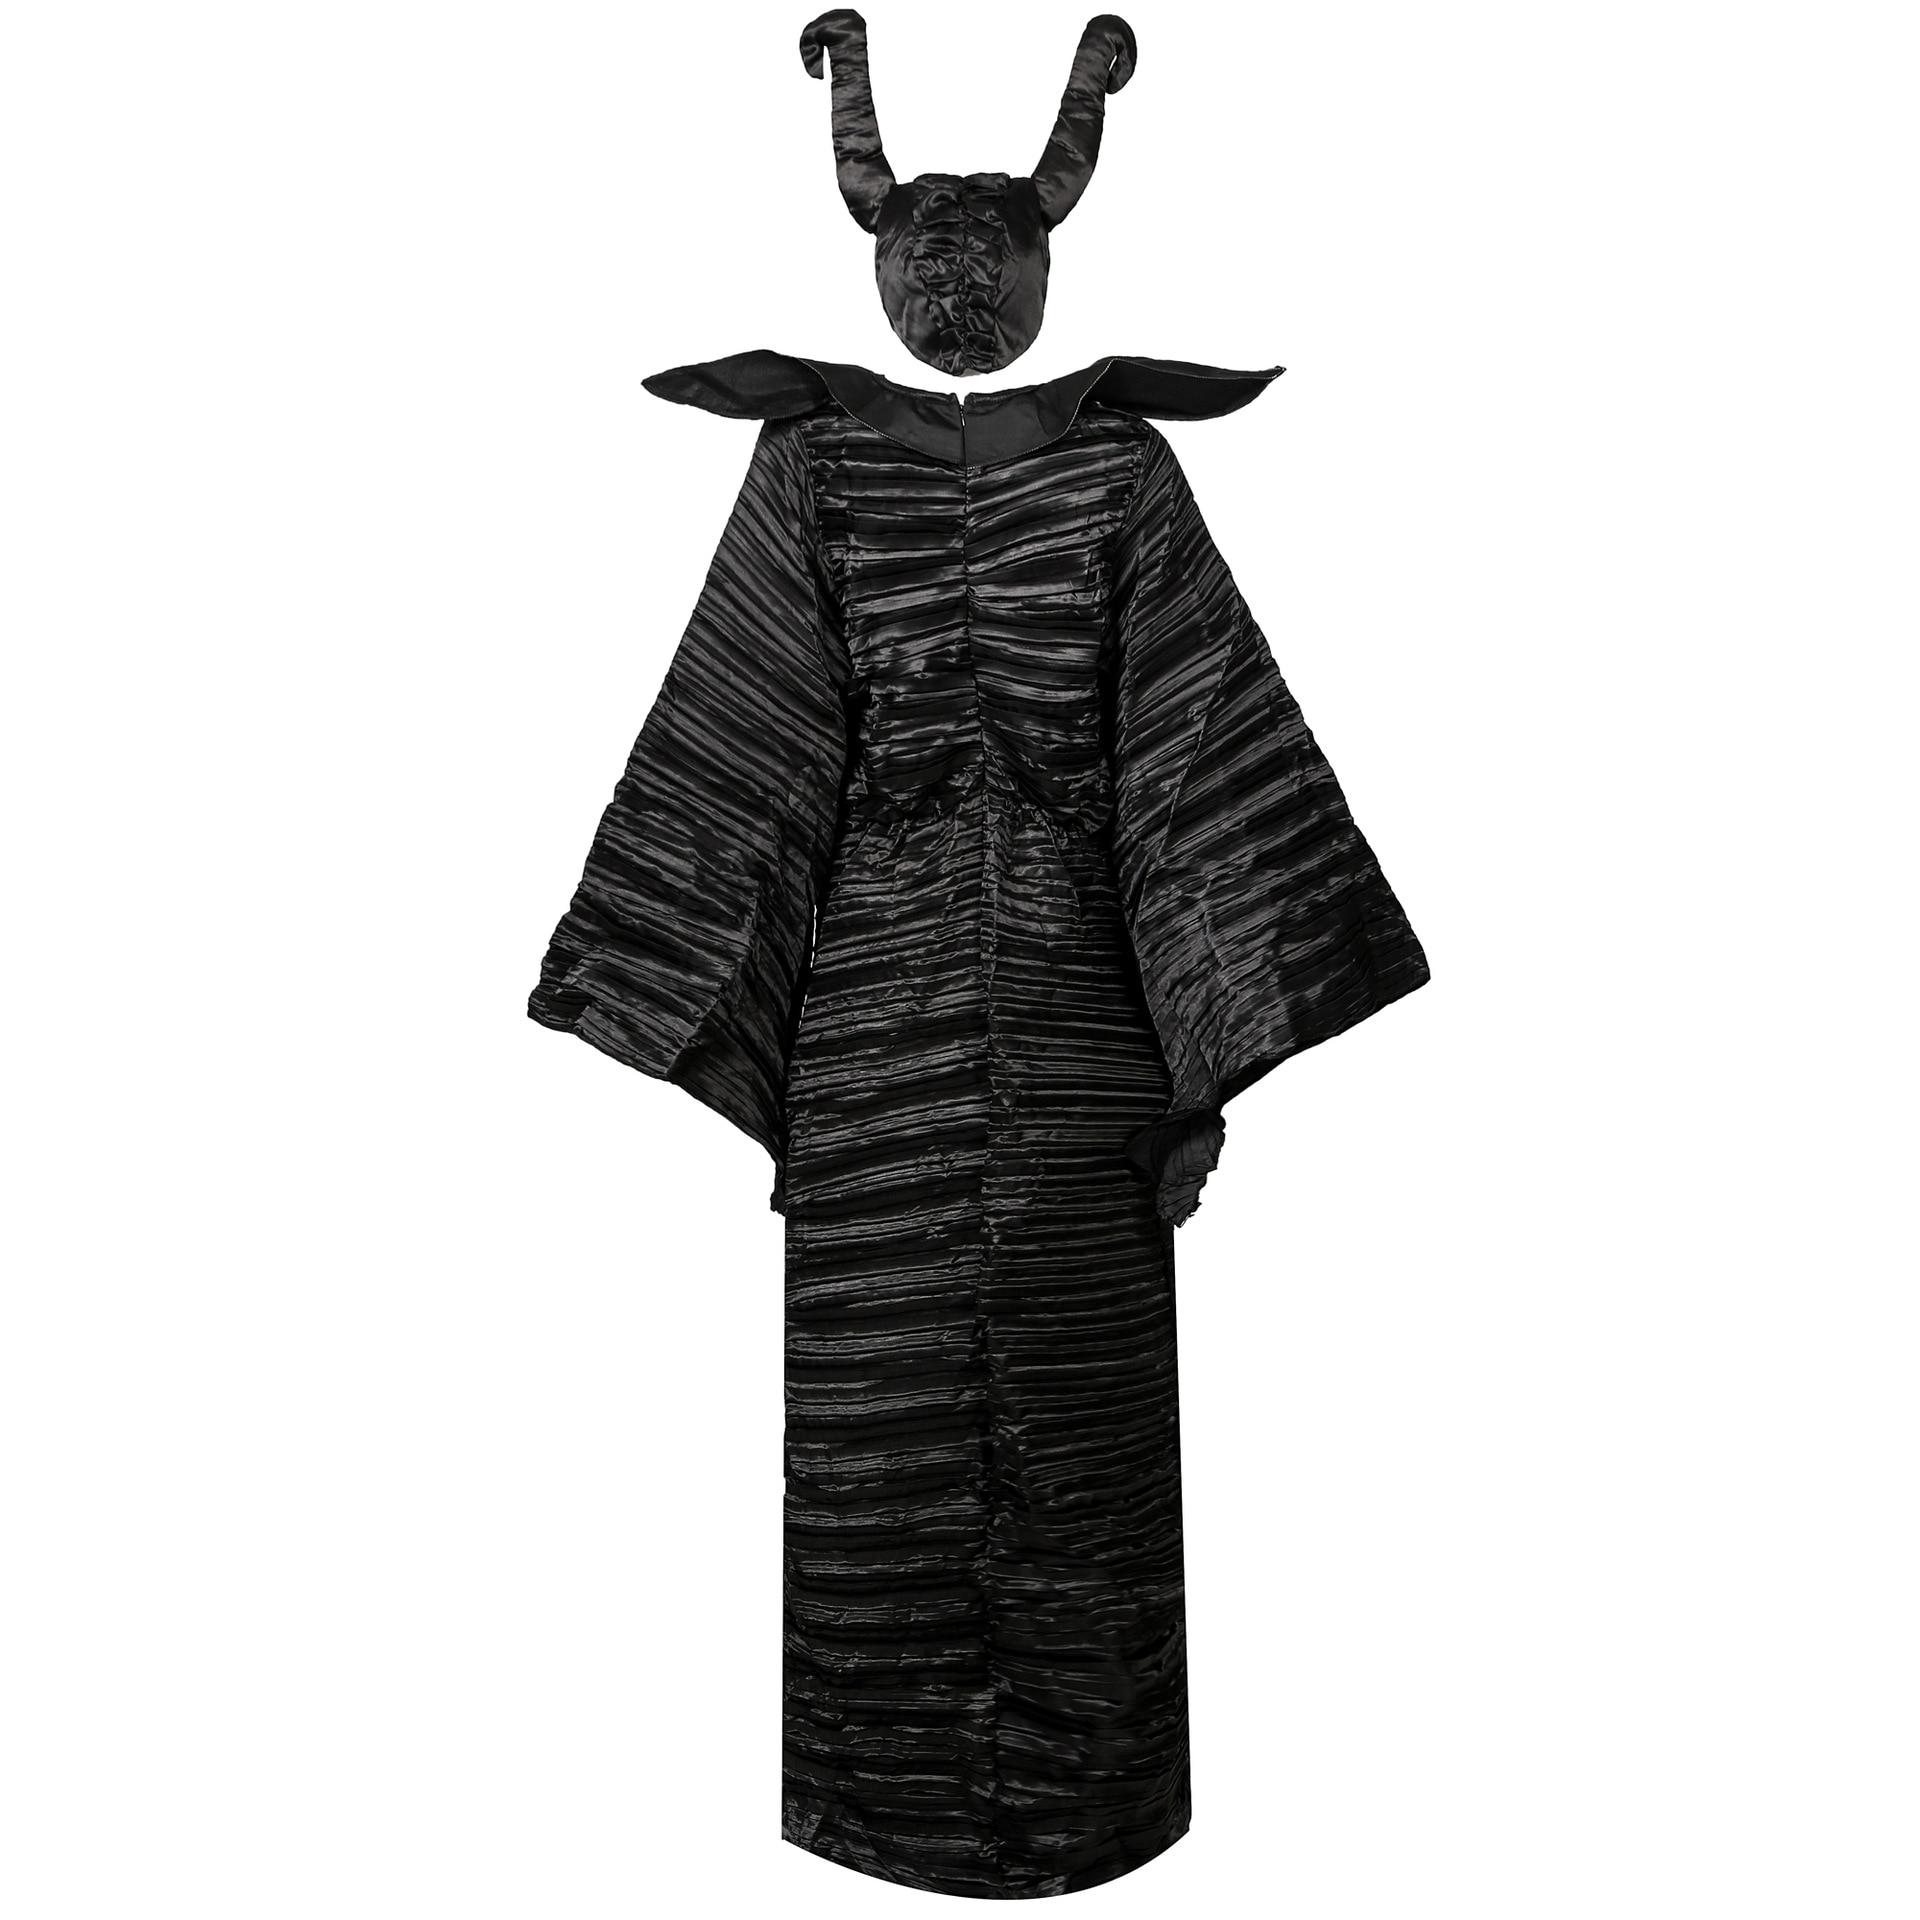 Maleficent Costume Adult Halloween Fancy Dress